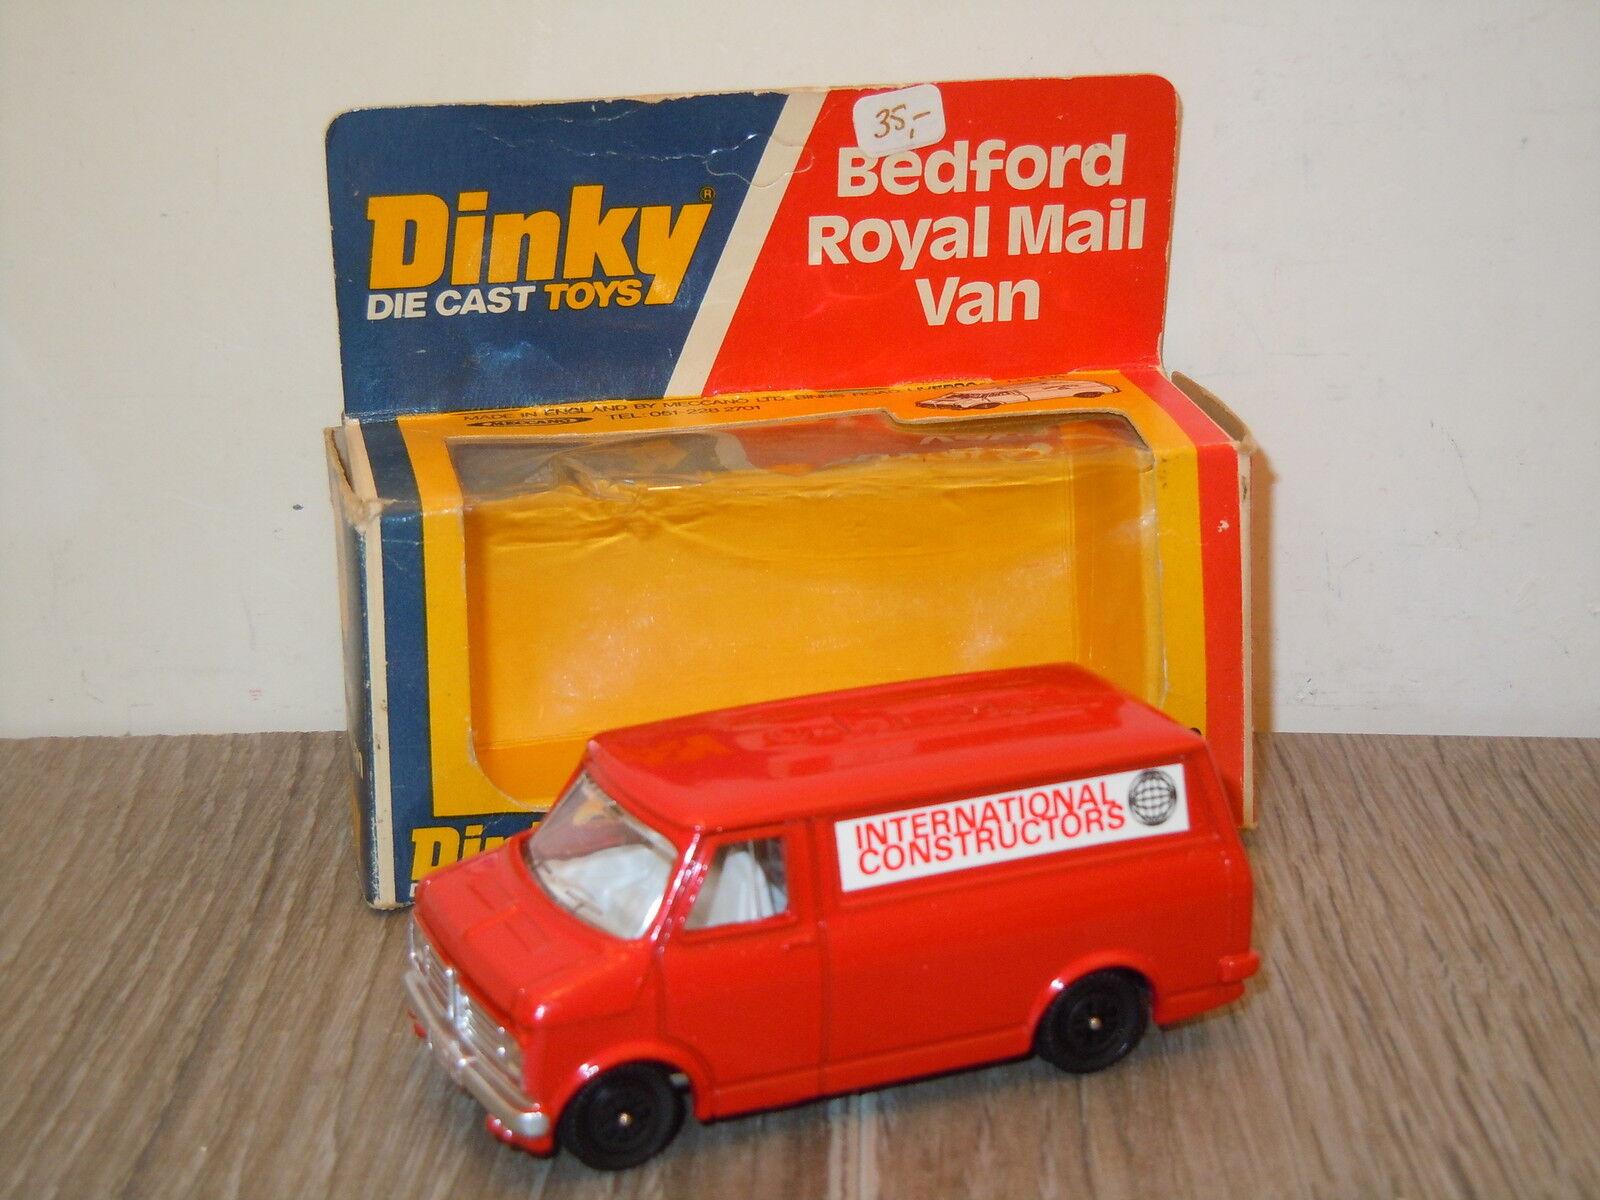 Bedford International Constructors VAN DINKY TOYS code 2  John Gay dans Box  15711  vente de renommée mondiale en ligne